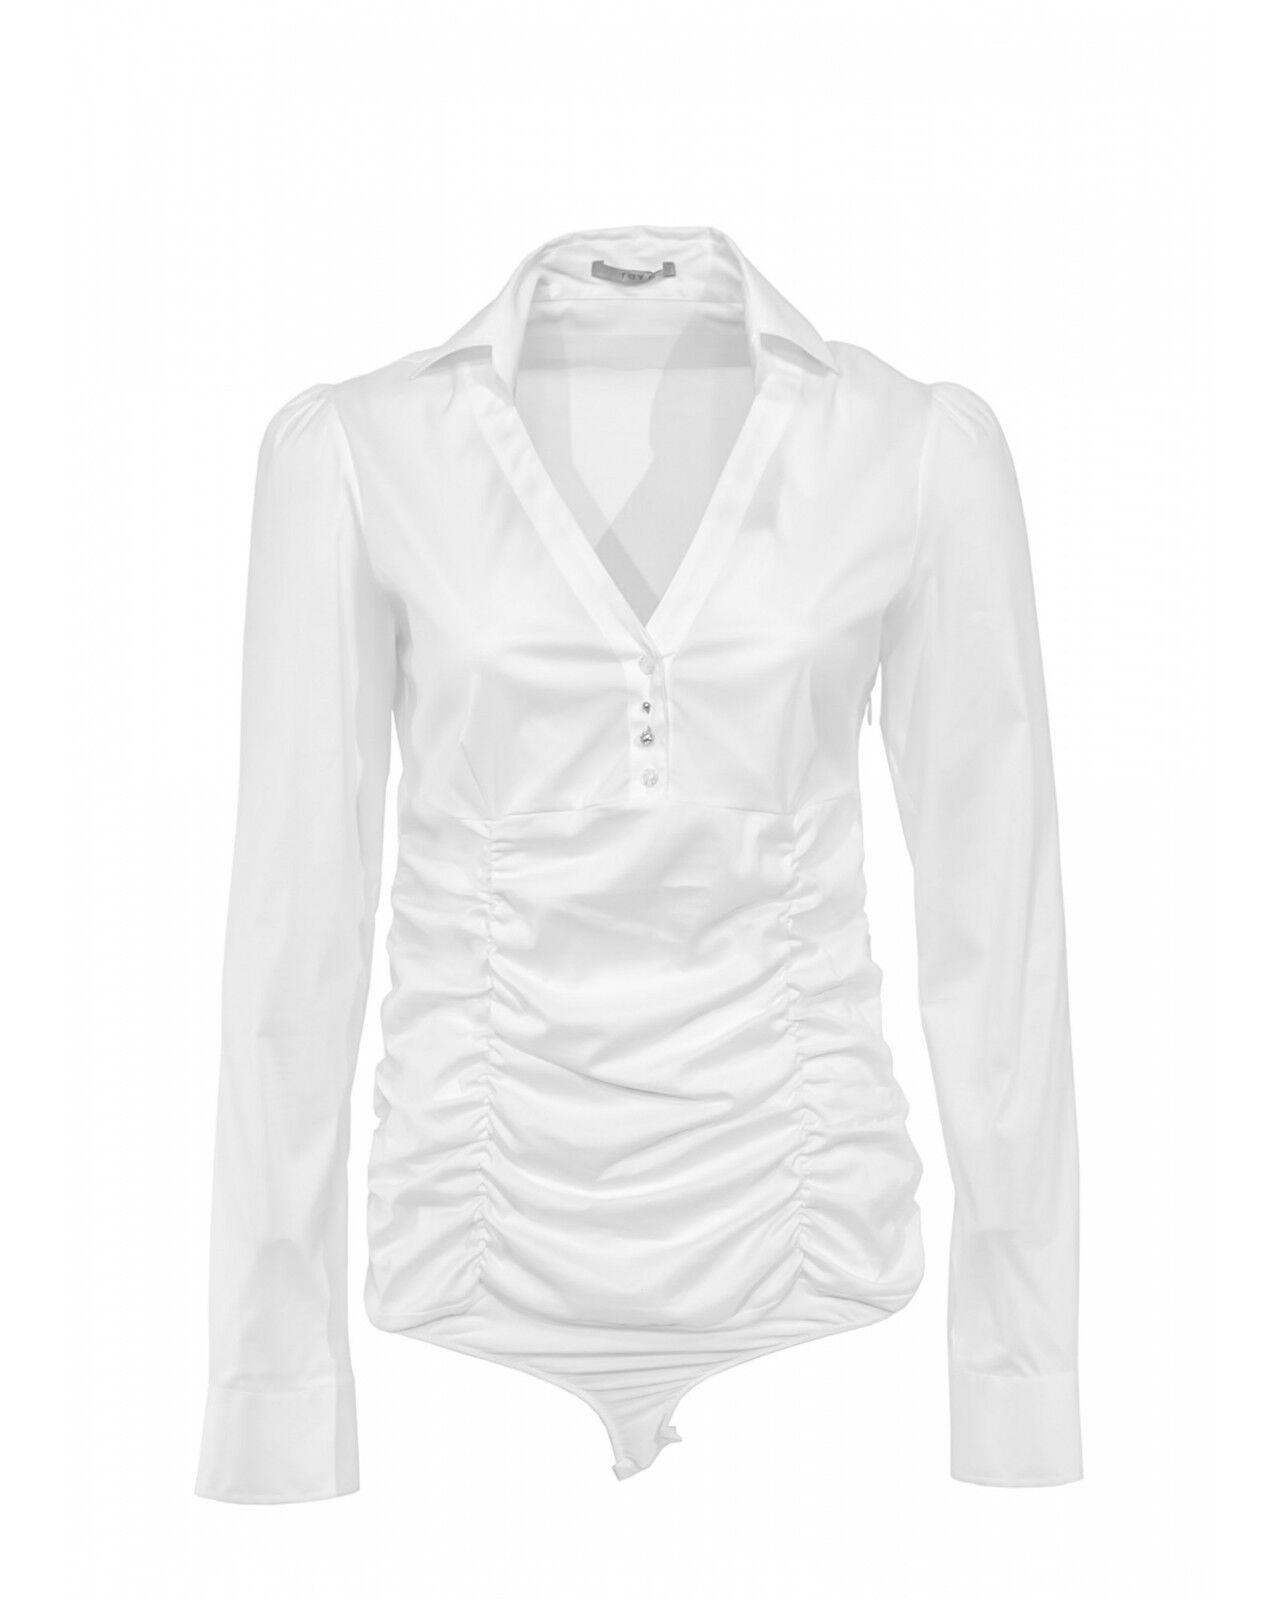 Body In A GCon Fondo Saldo Donna Ea4d69 Camicia Toy UzVGLMqSp